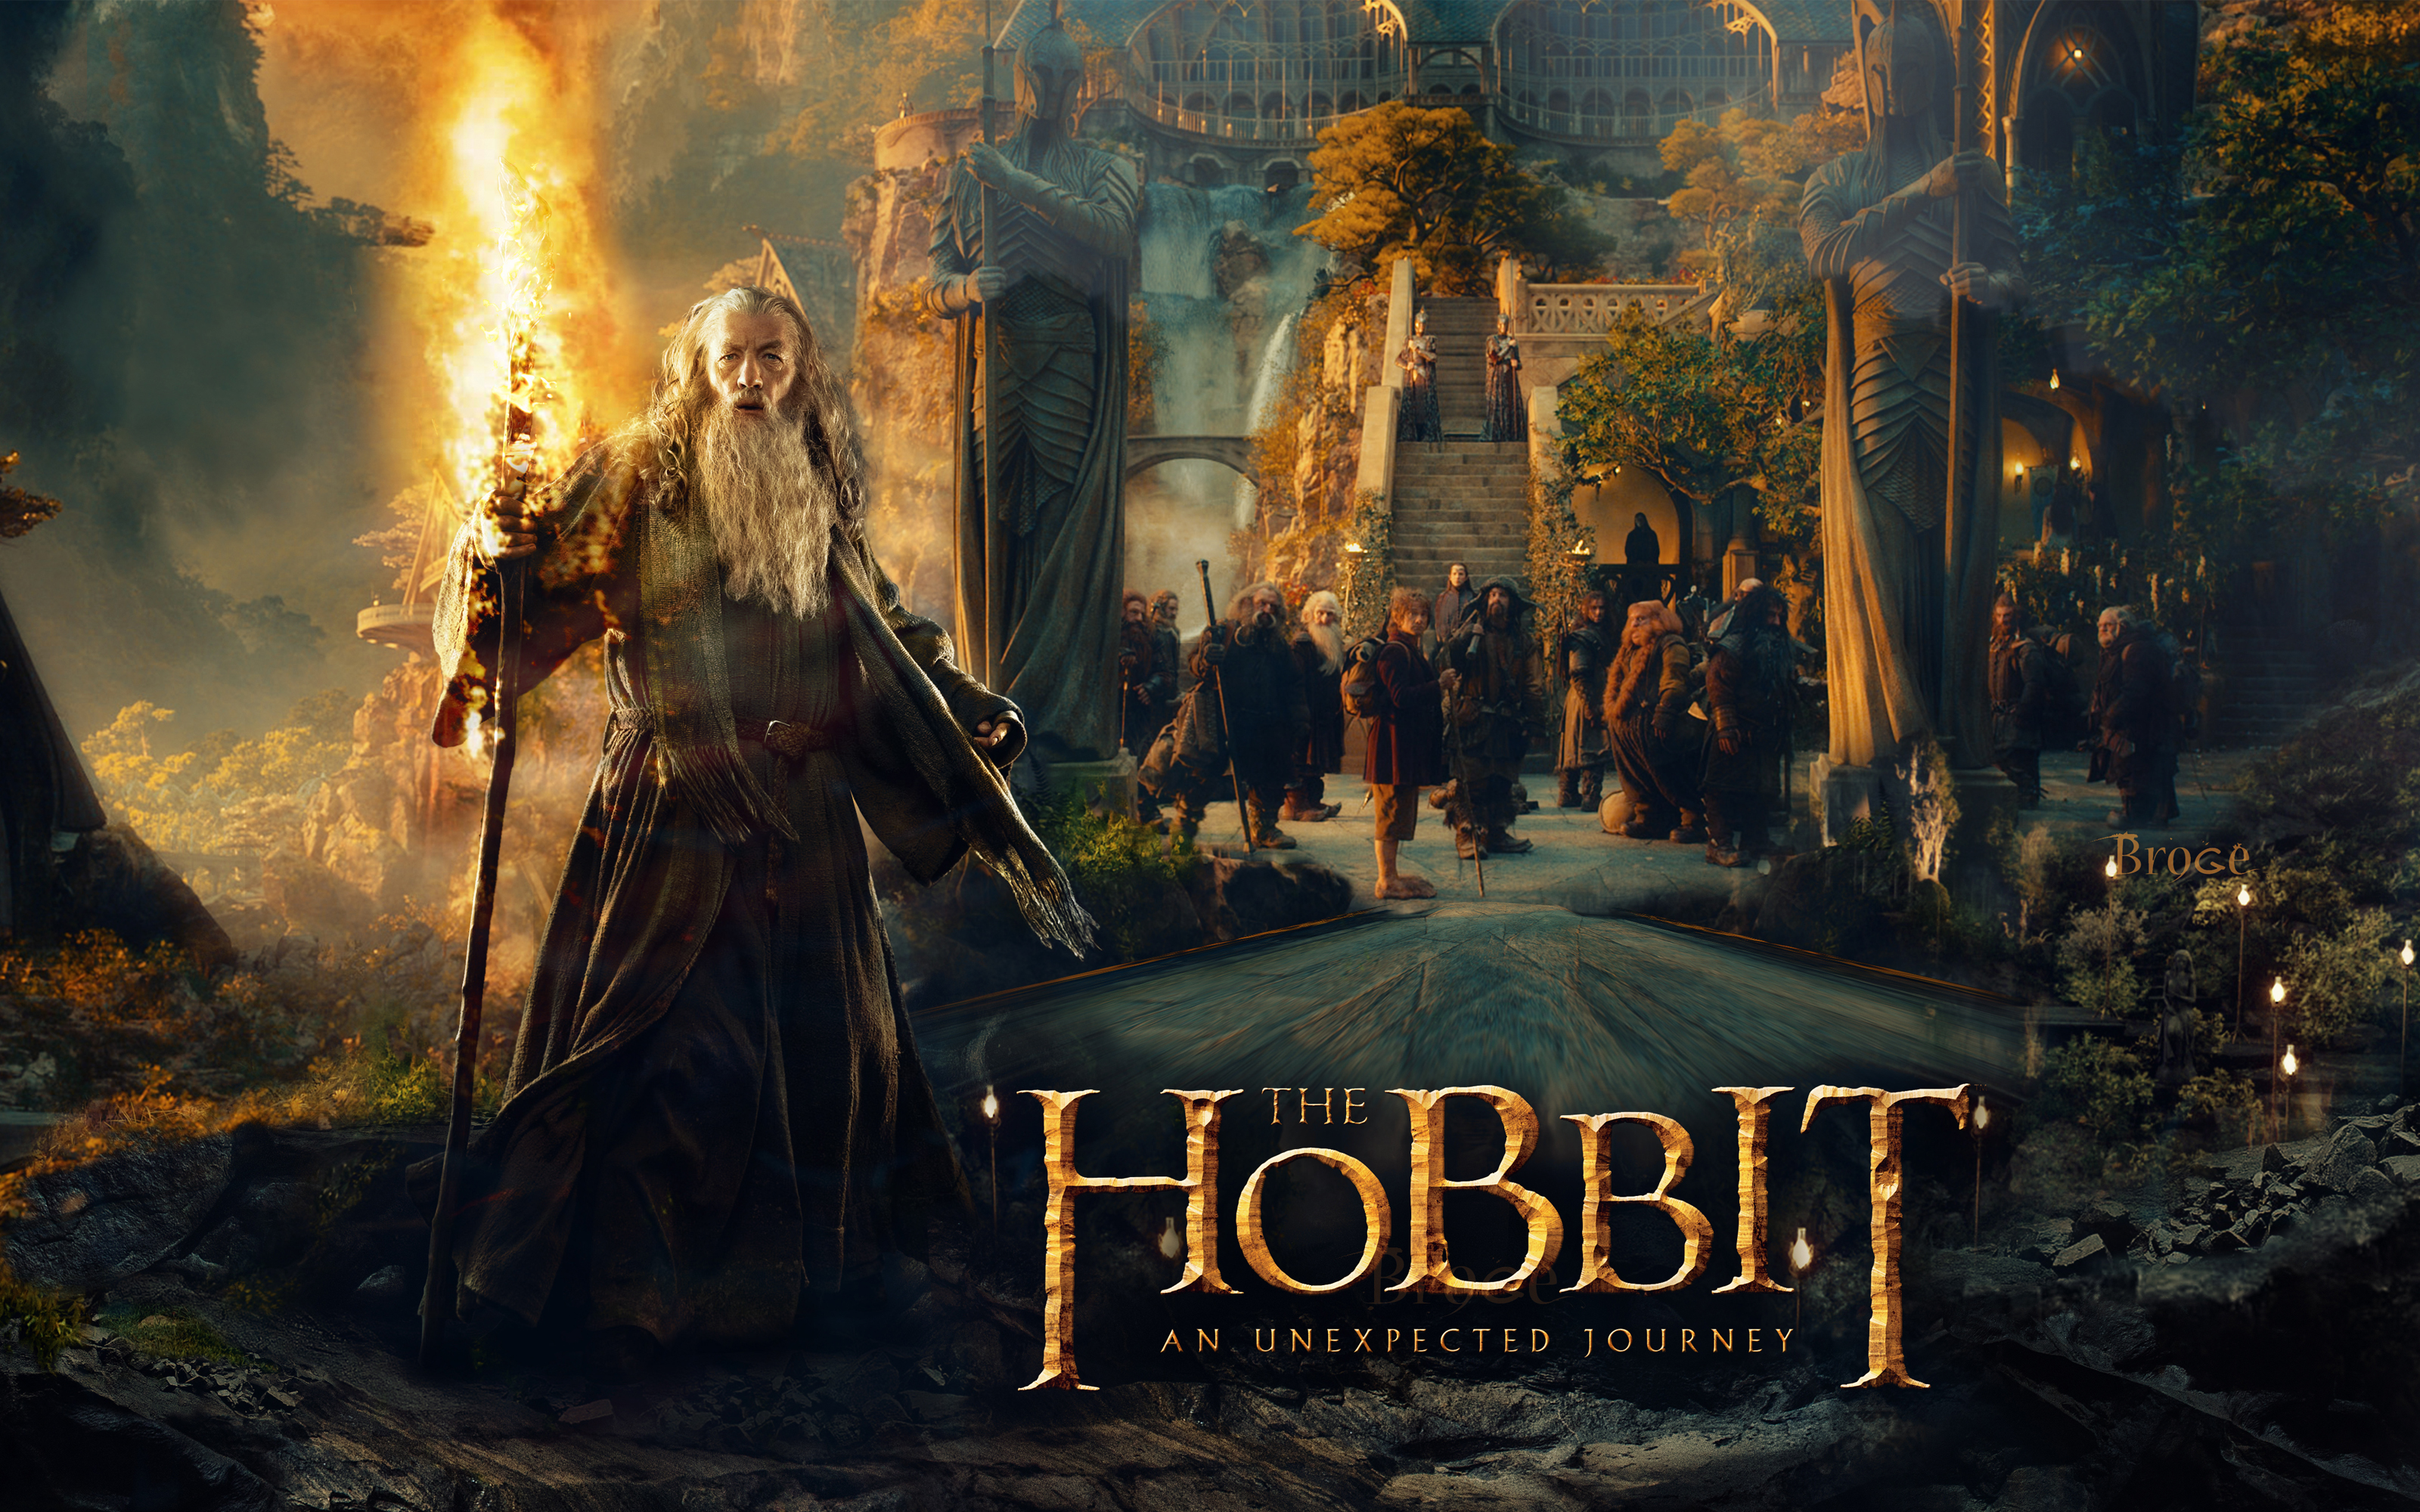 the hobbit an unexpected journey   The Hobbit Wallpaper 3200x2000